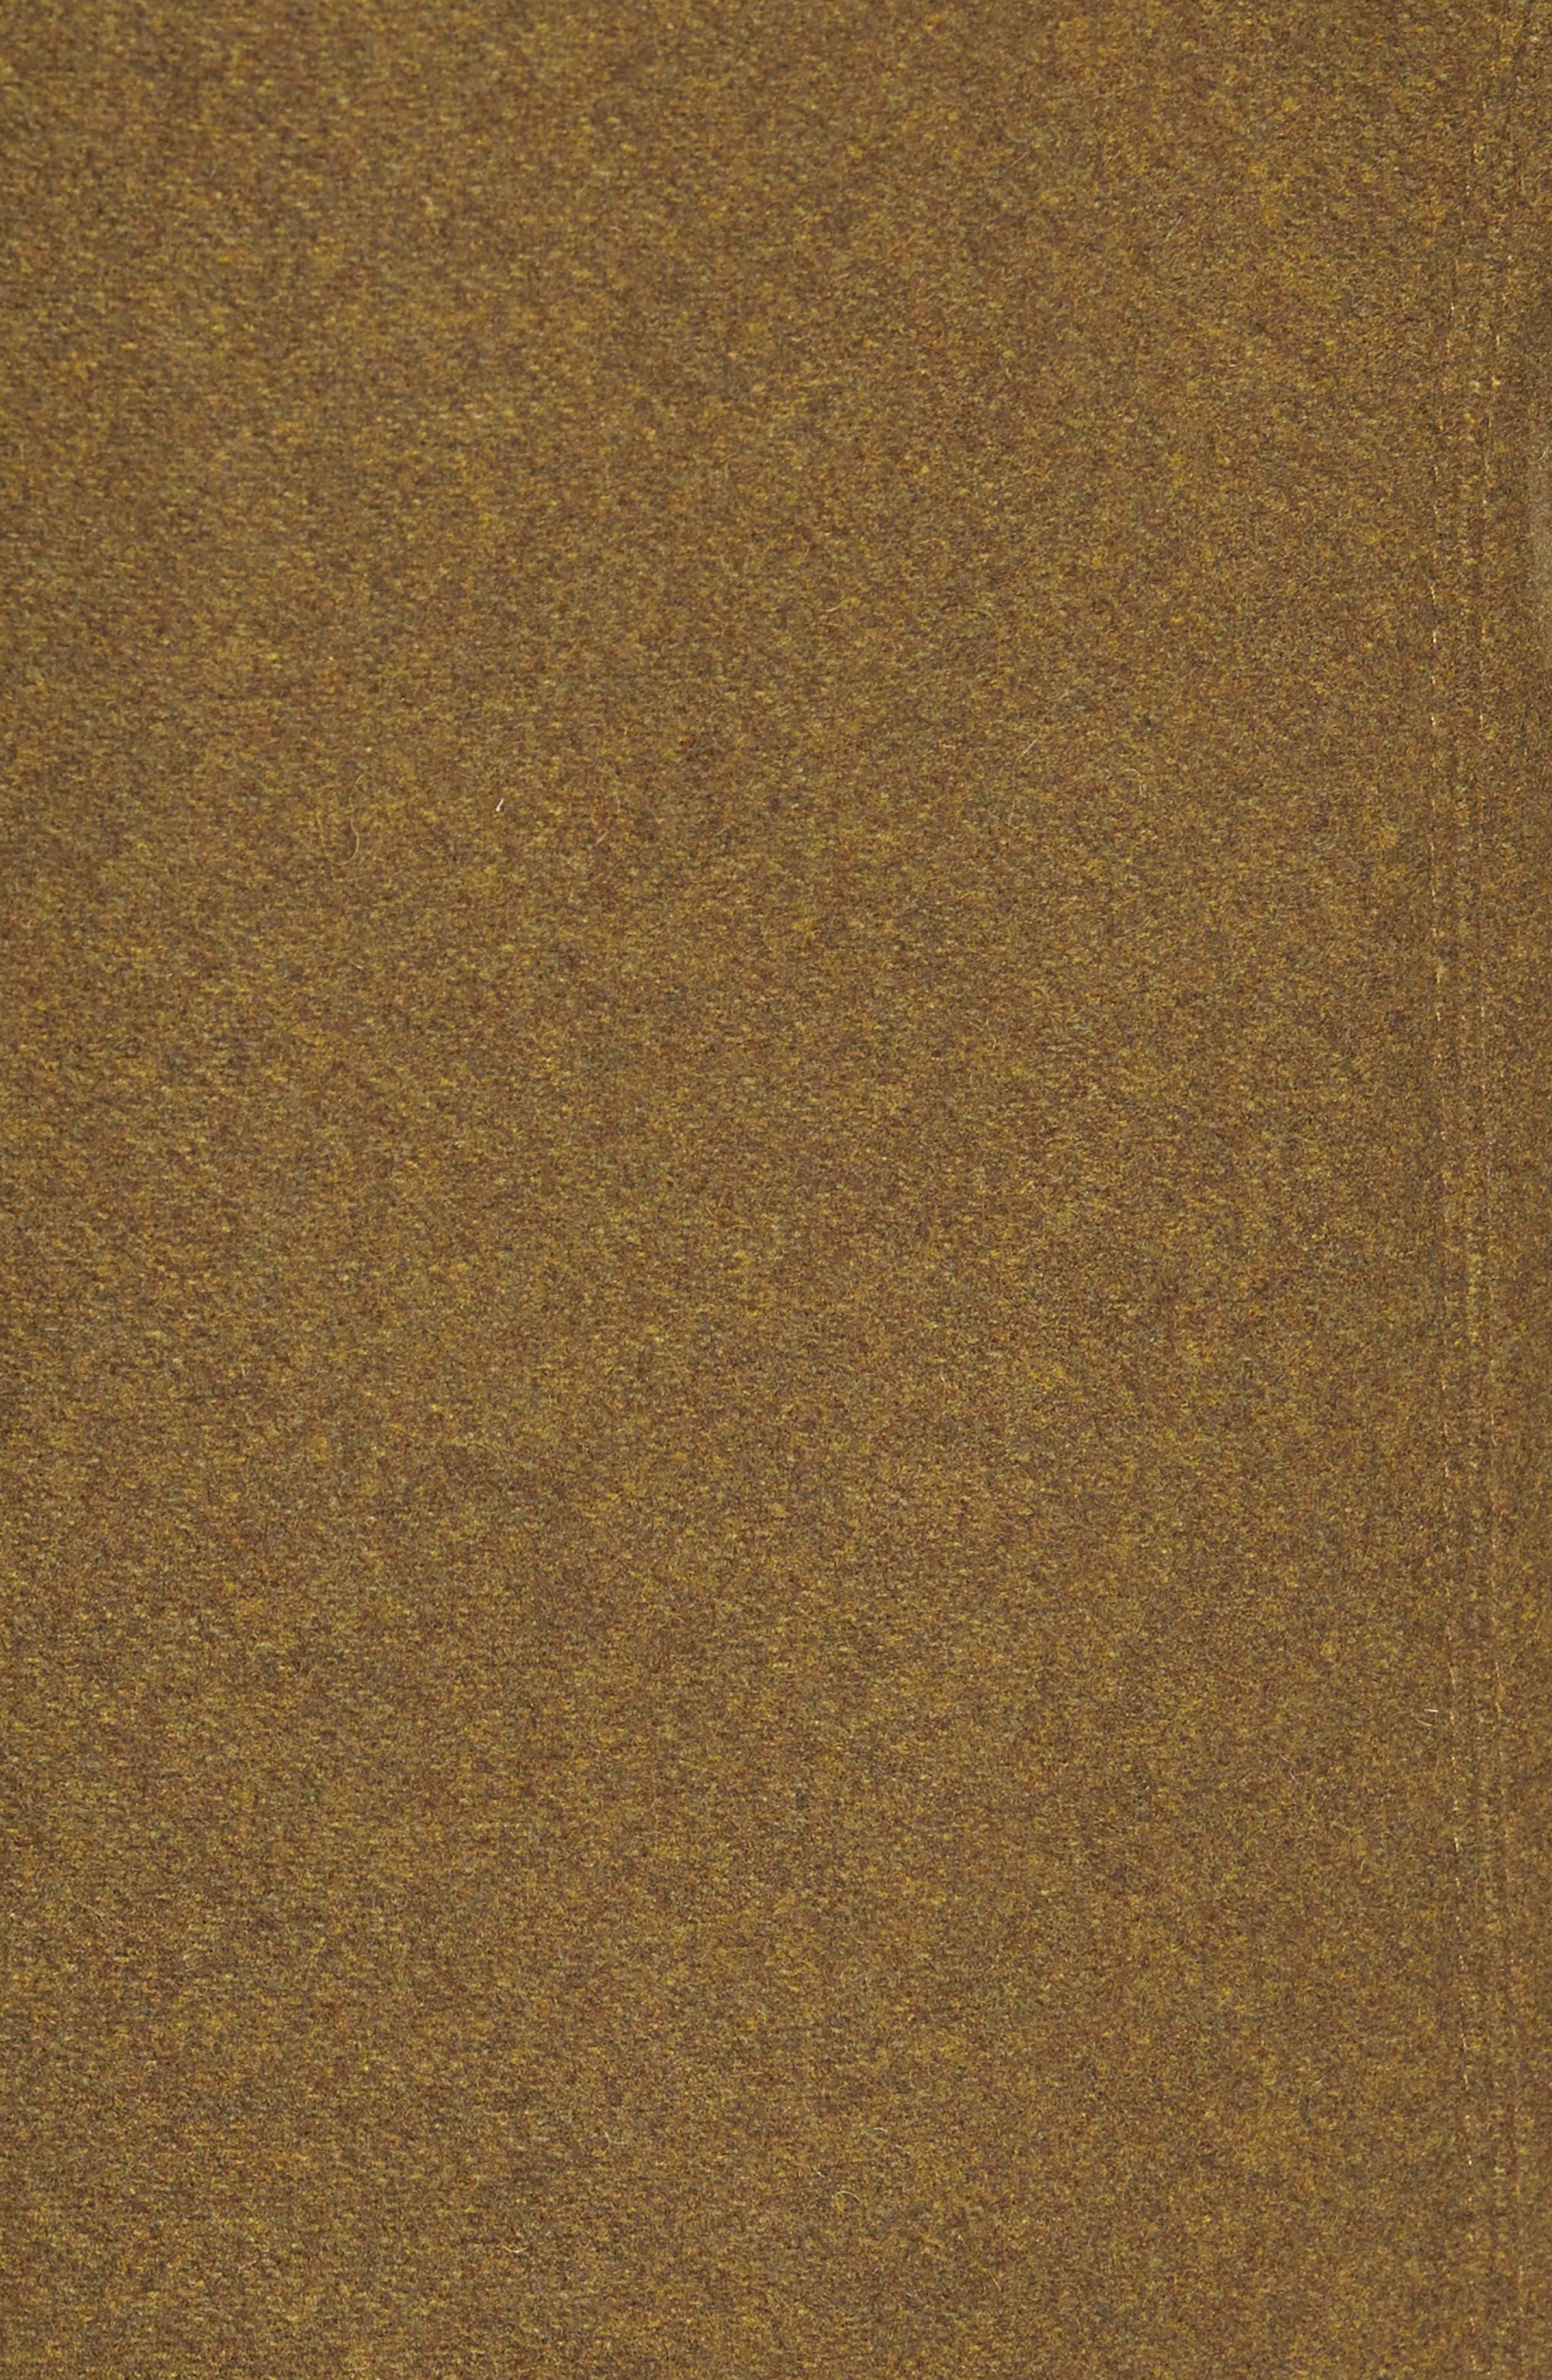 Embellished Slim Wool Blend Peacoat,                             Alternate thumbnail 6, color,                             252